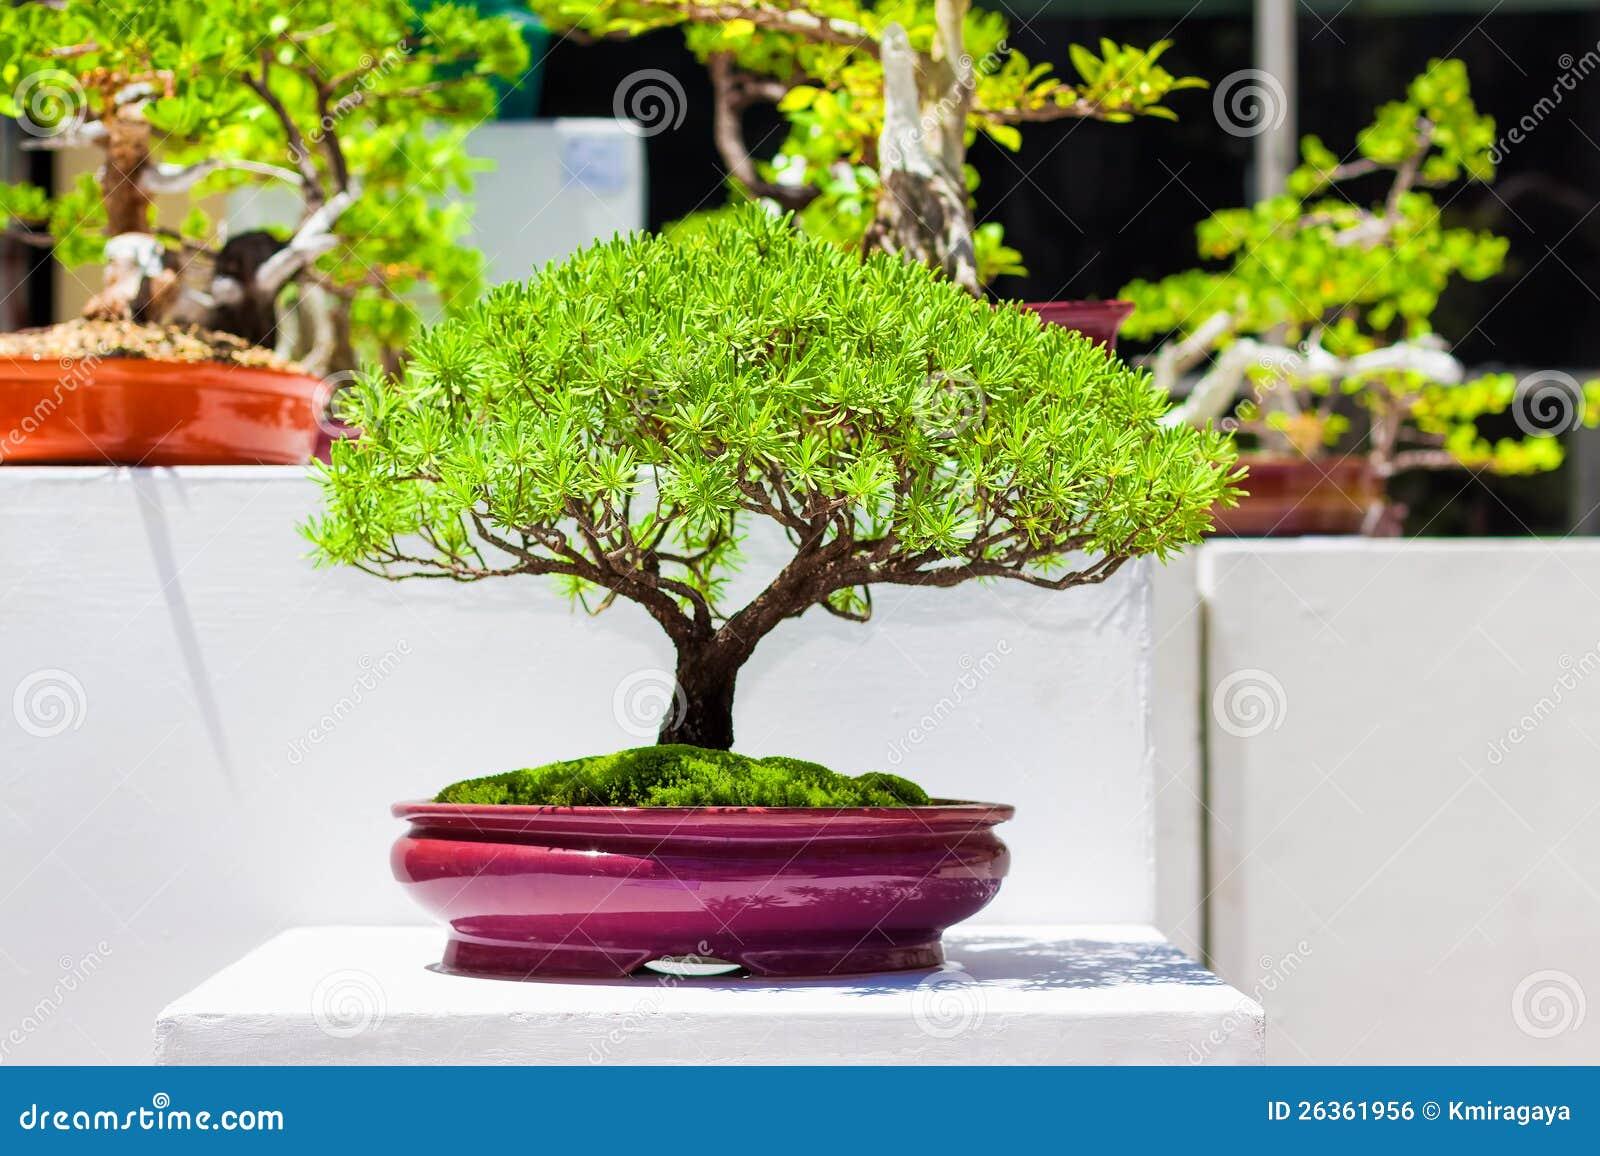 Rboles japoneses de los bonsais imagen de archivo libre for Arboles japoneses para jardin